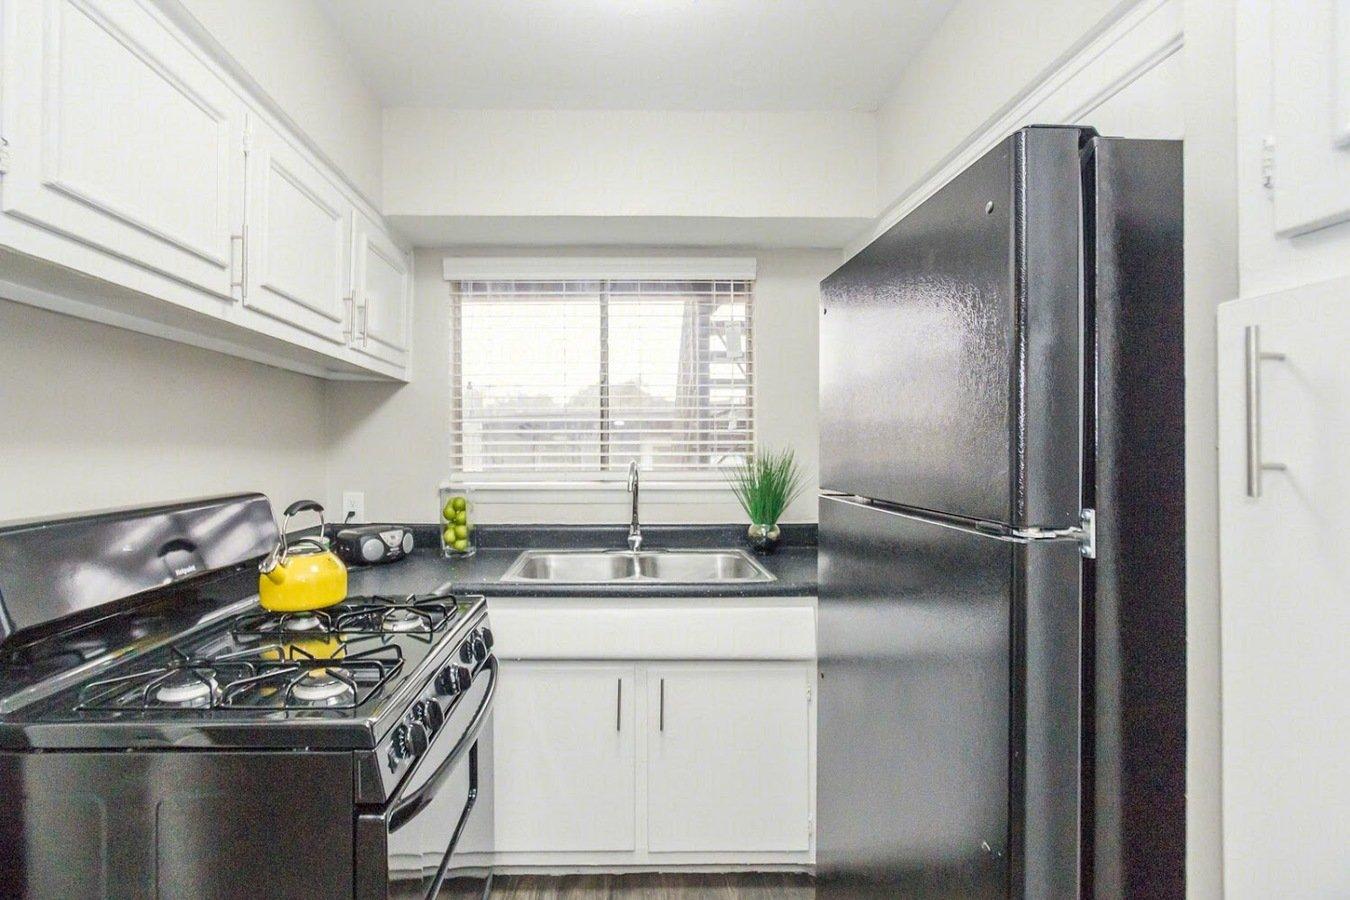 1 Bedroom 1 Bathroom Apartment for rent at Urbana Apartments in San Antonio, TX